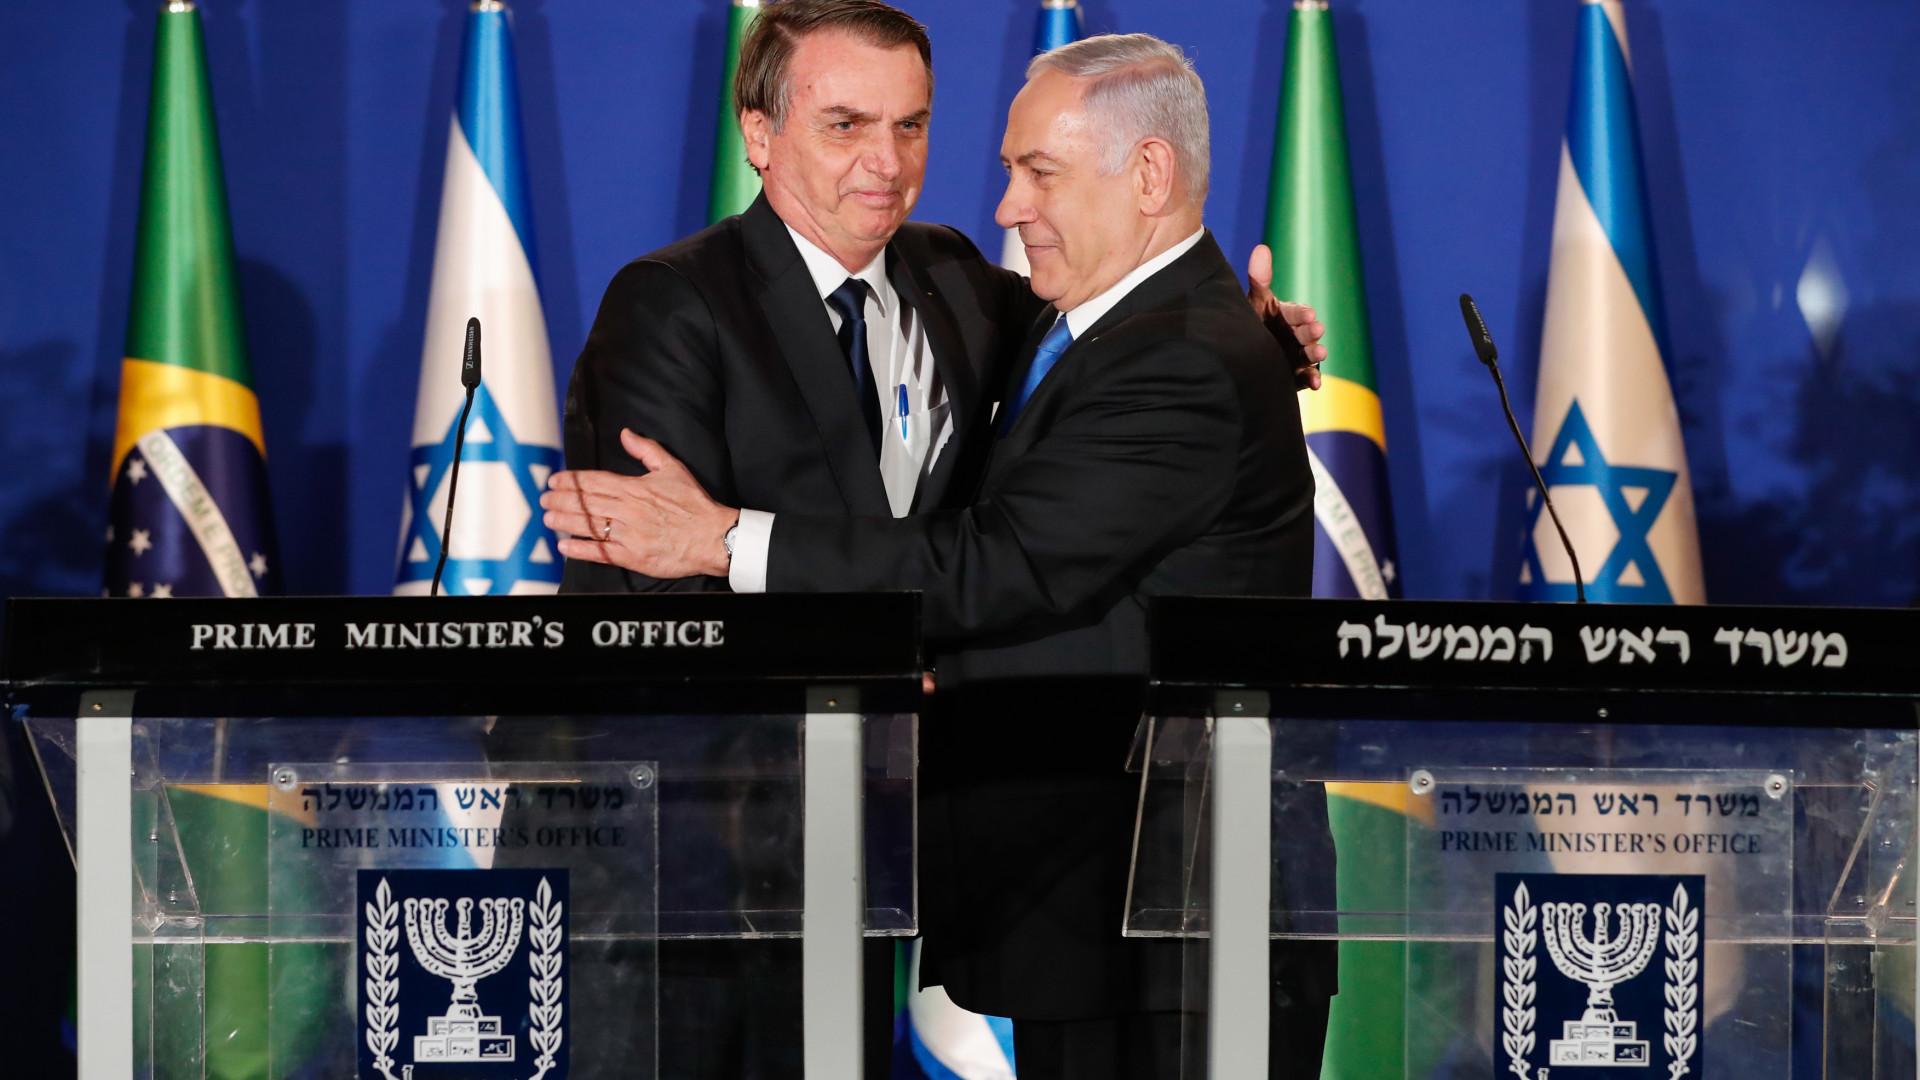 Brasil e Israel se complementam, afirma Bolsonaro